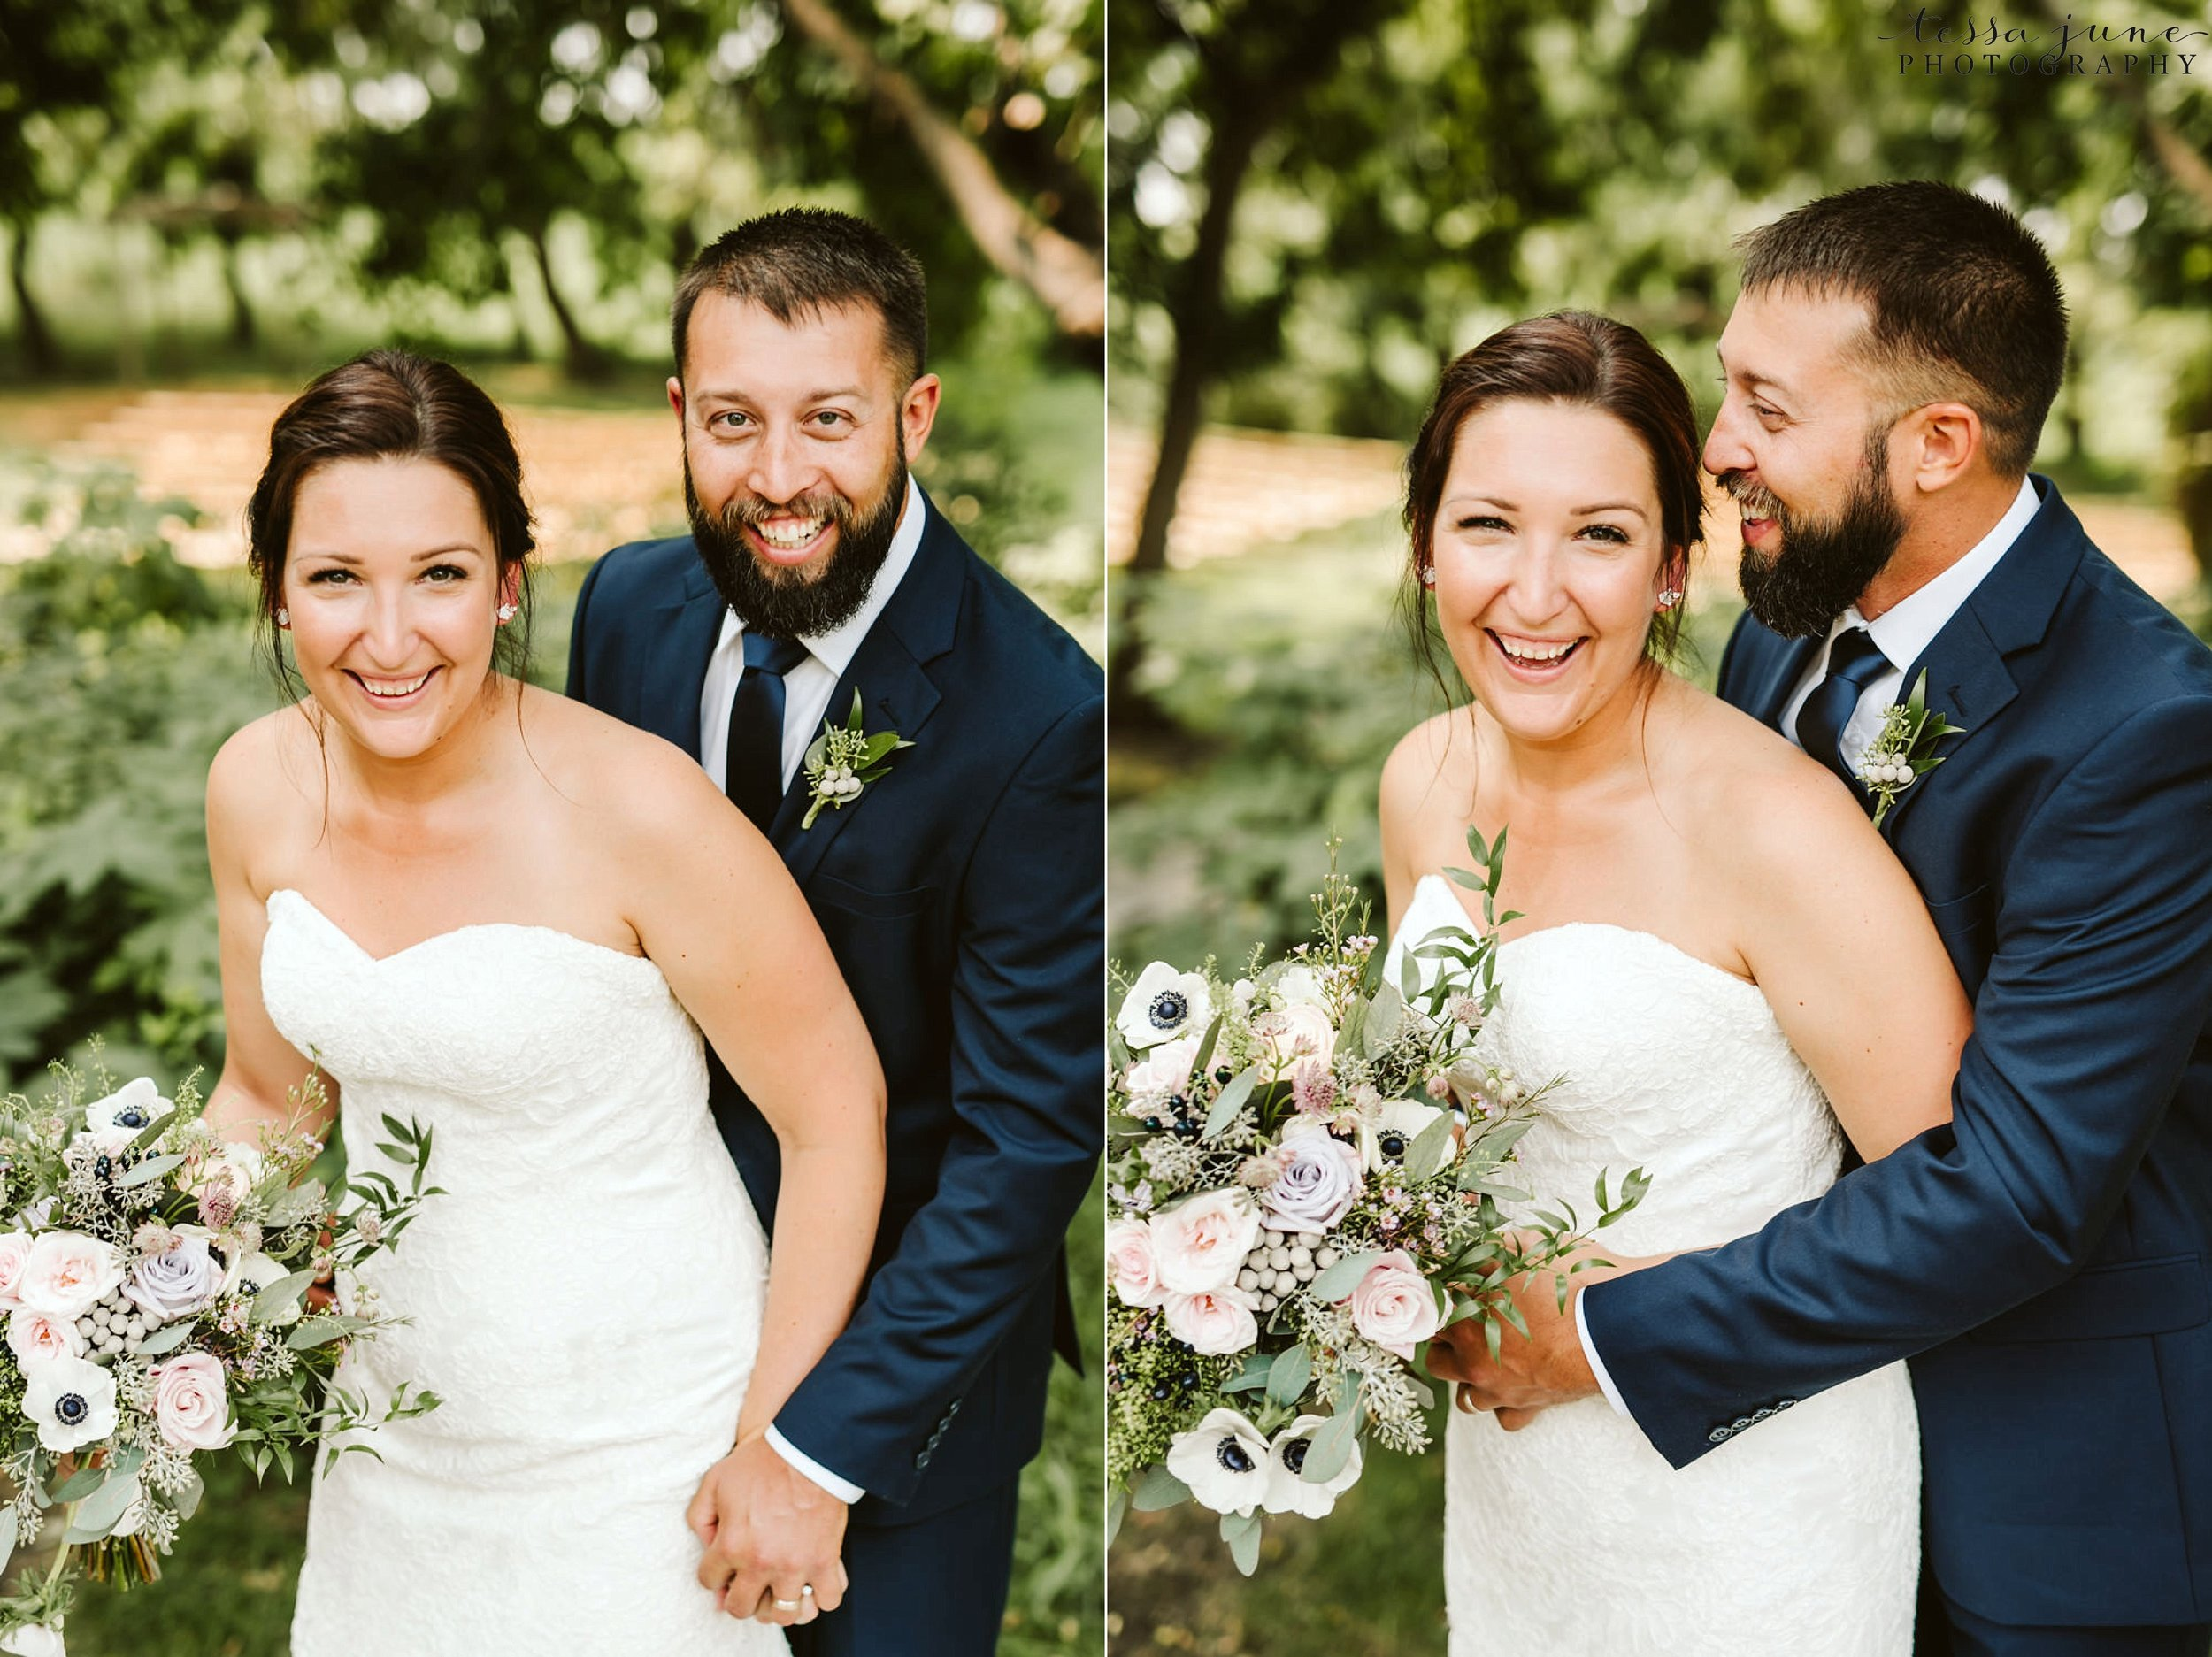 gathered-oaks-barn-wedding-alexandria-minnesota-42.jpg